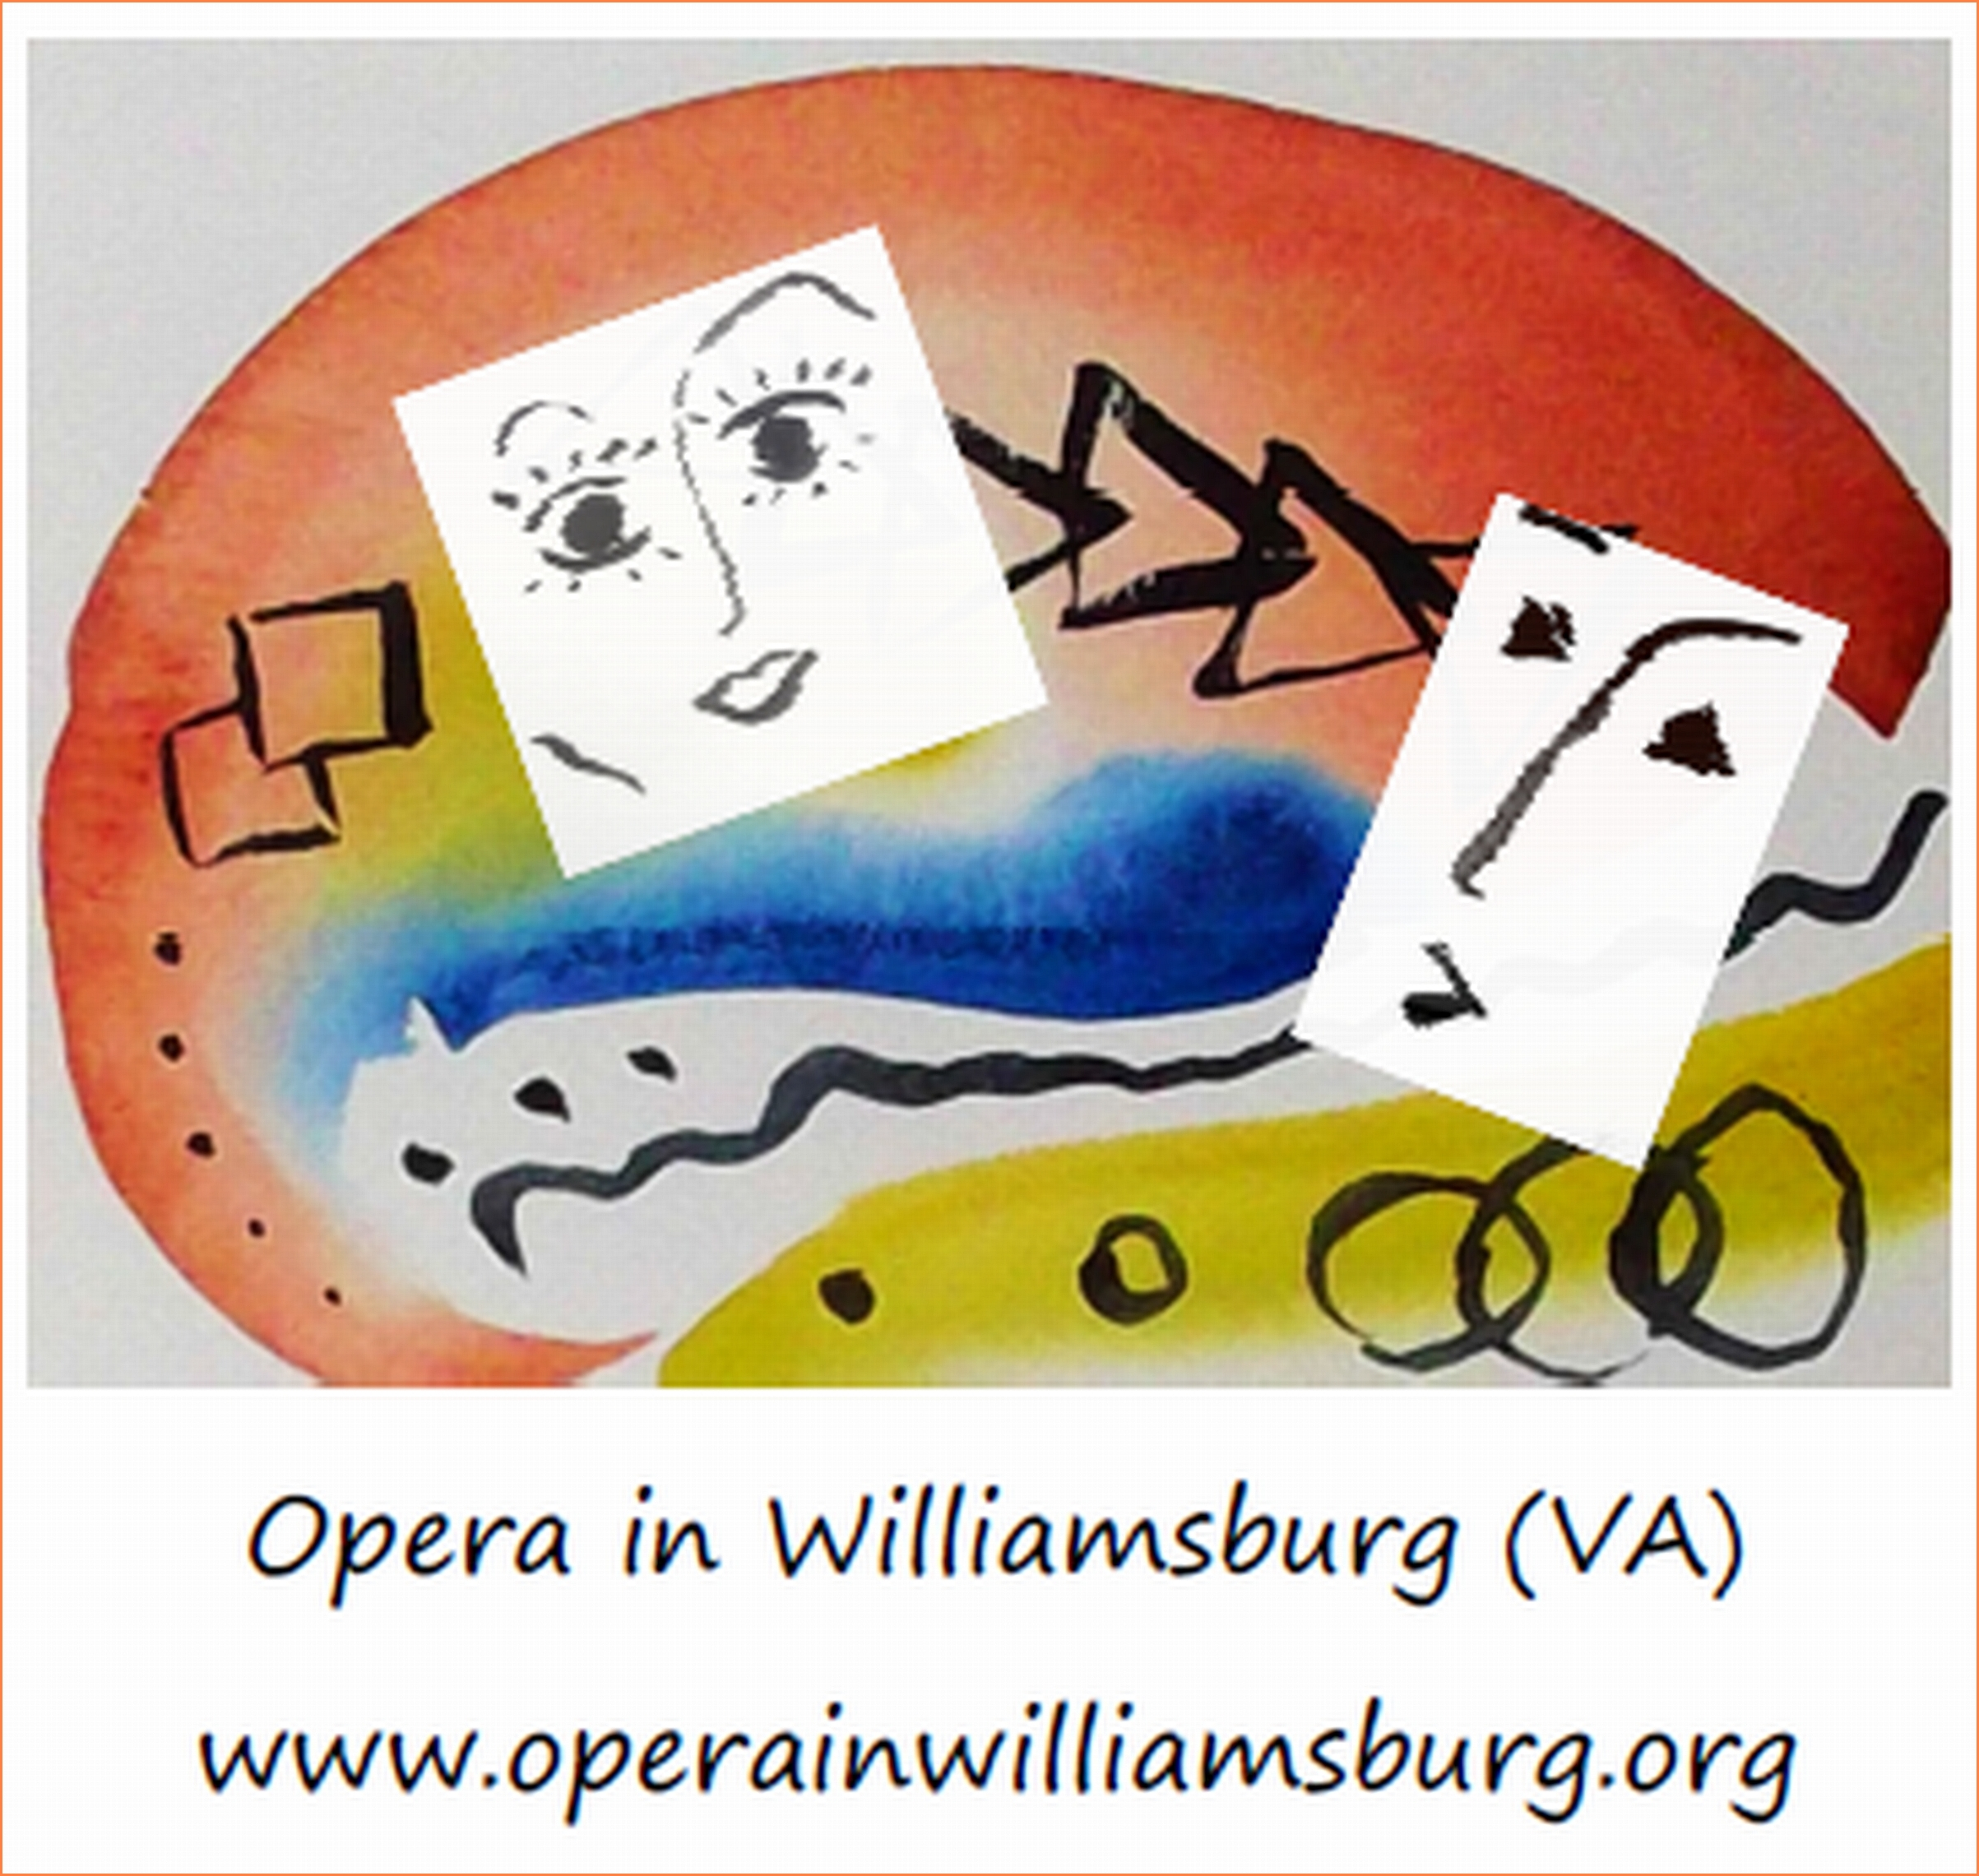 Opera in Williamsburg logo June 2013 hi res framed for group.jpg